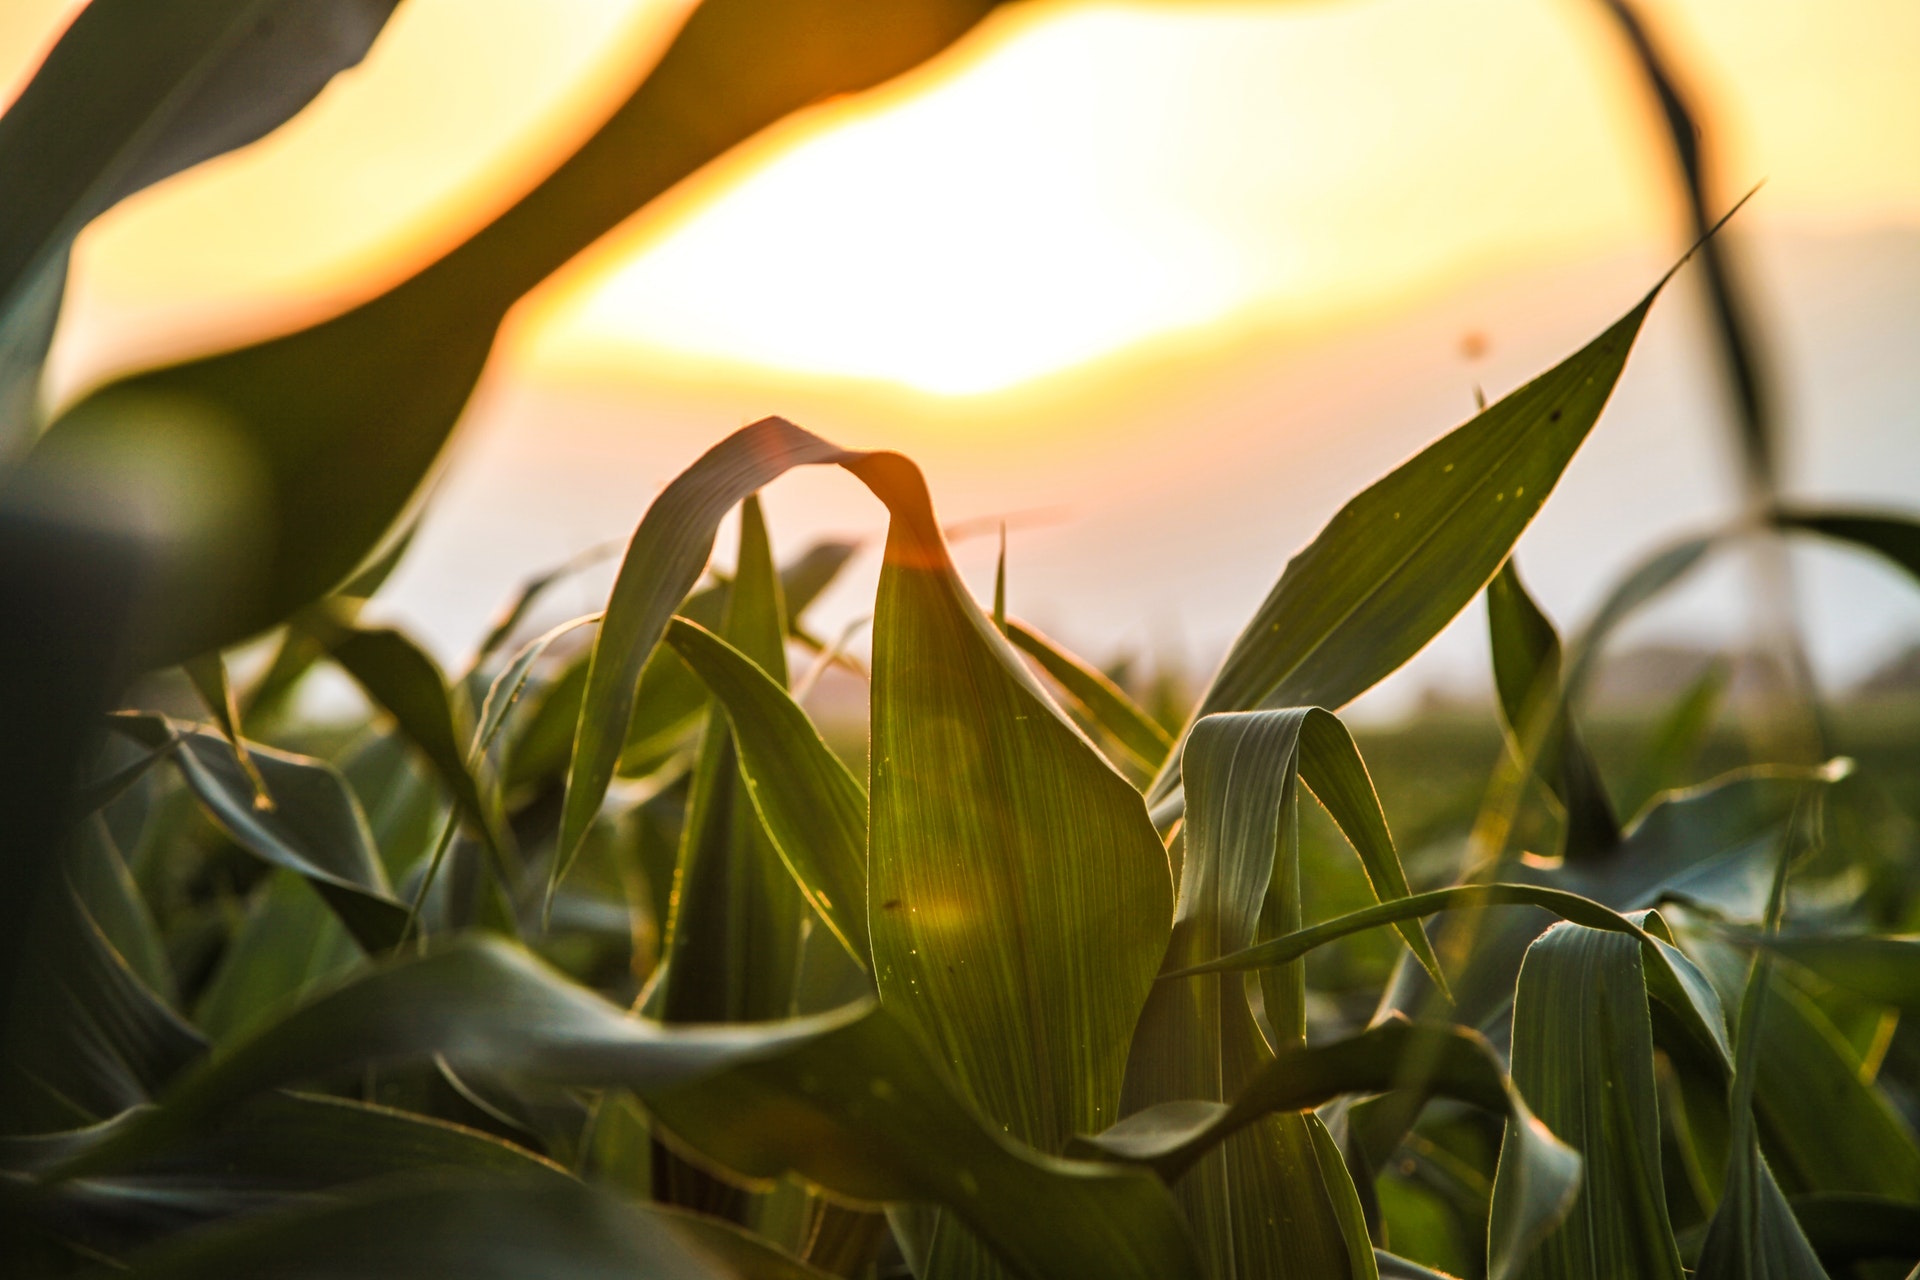 Corn maze | Outdoorsy RV Rental Marketplace